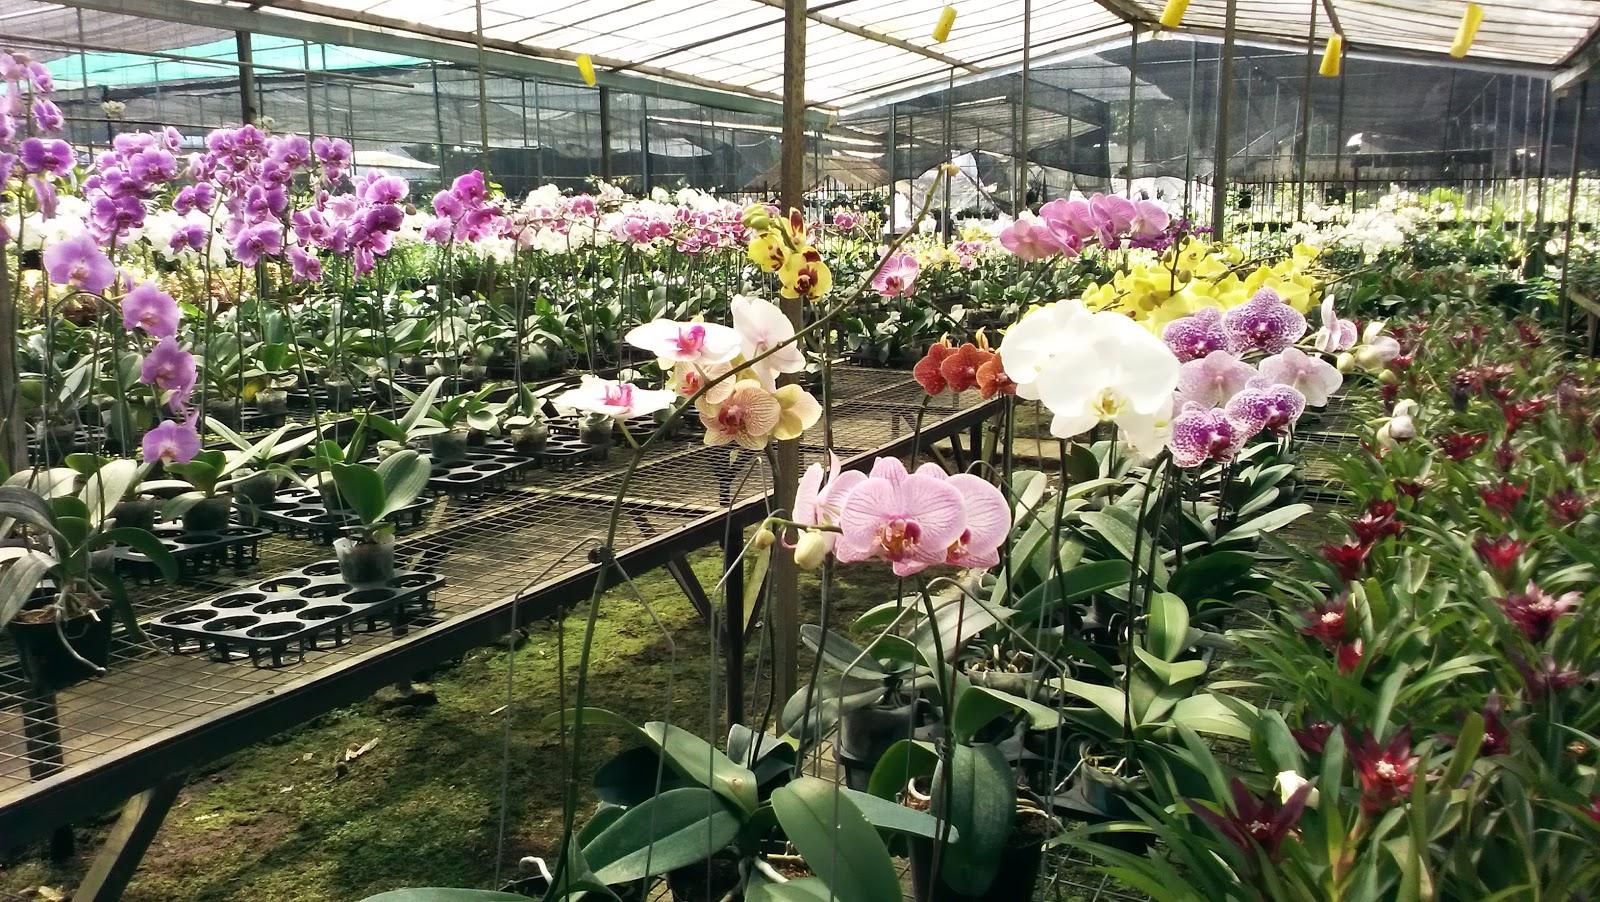 Tukang Bunga Anggrek Bunga Angrek Bulan Petani Angrek Pusat